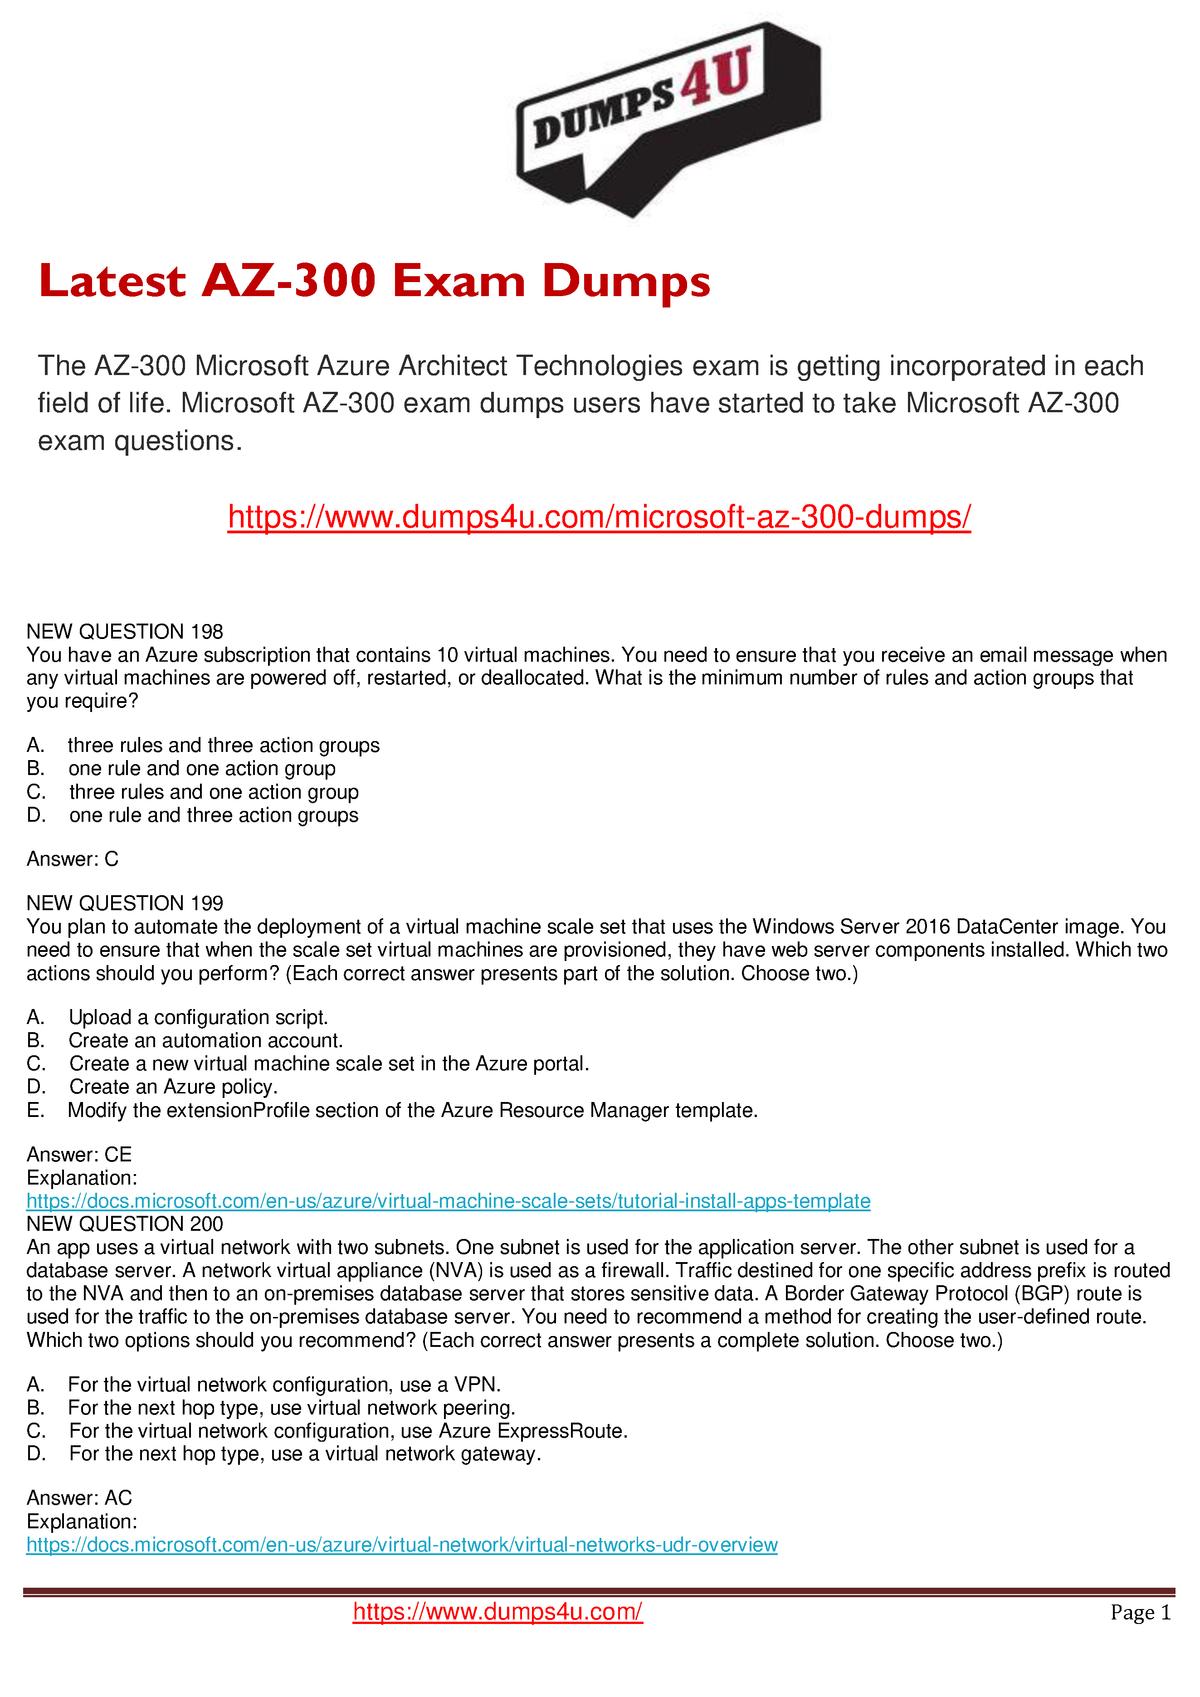 Microsoft AZ-300 Dumps 2019 | AZ-300 Questions - INFO 202